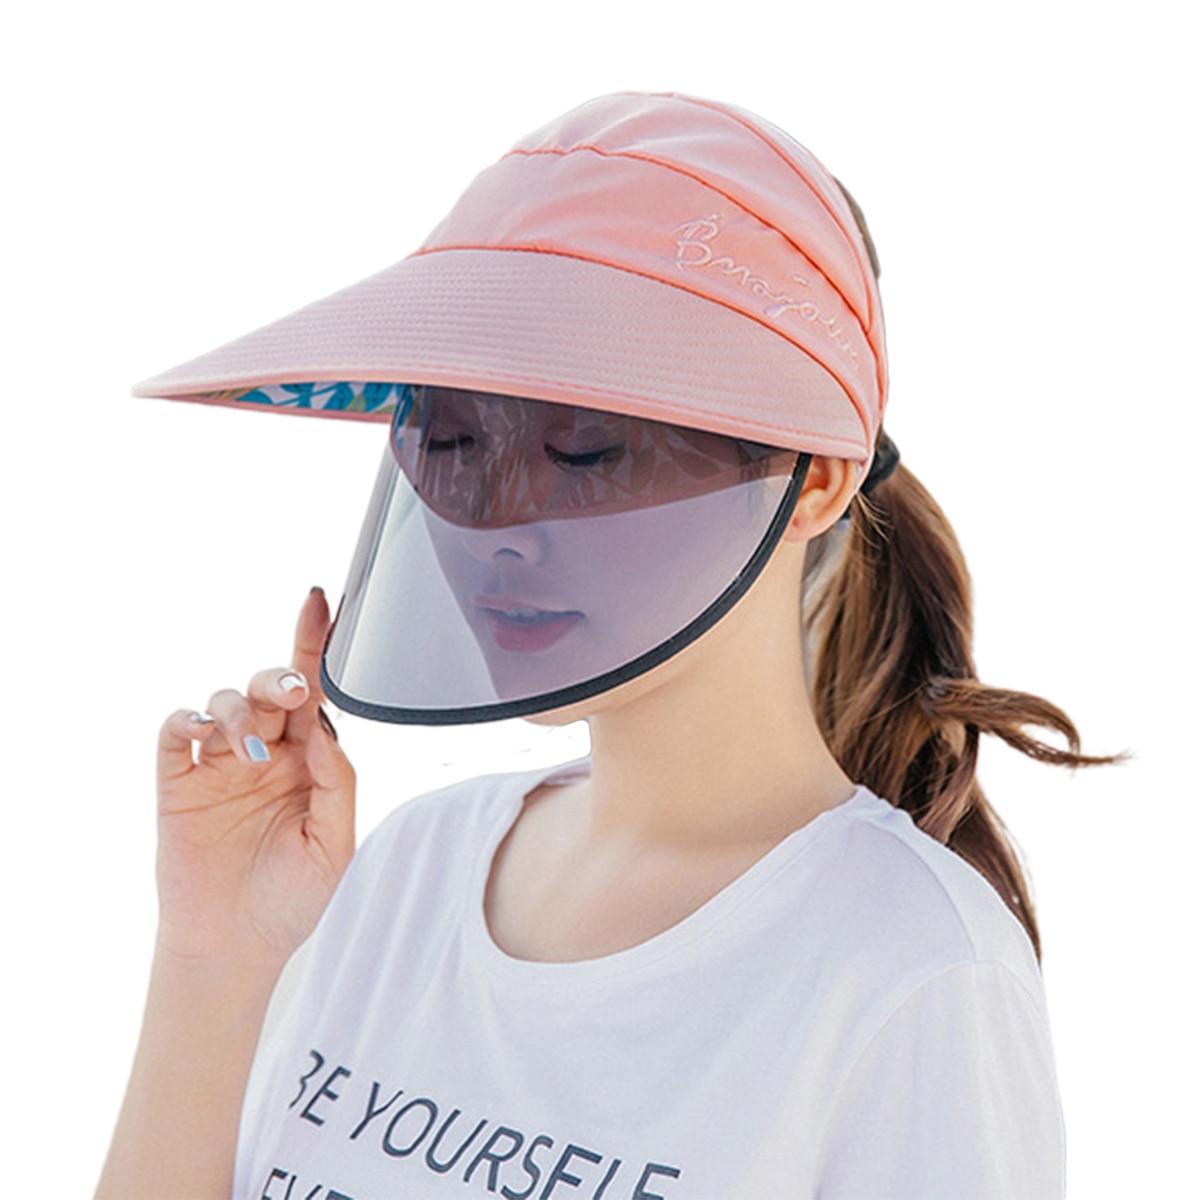 Women Solar Visor Hat, Wide Brim UV Protection Summer Beach Cap with Adjustable Visor for Outdoor Activities